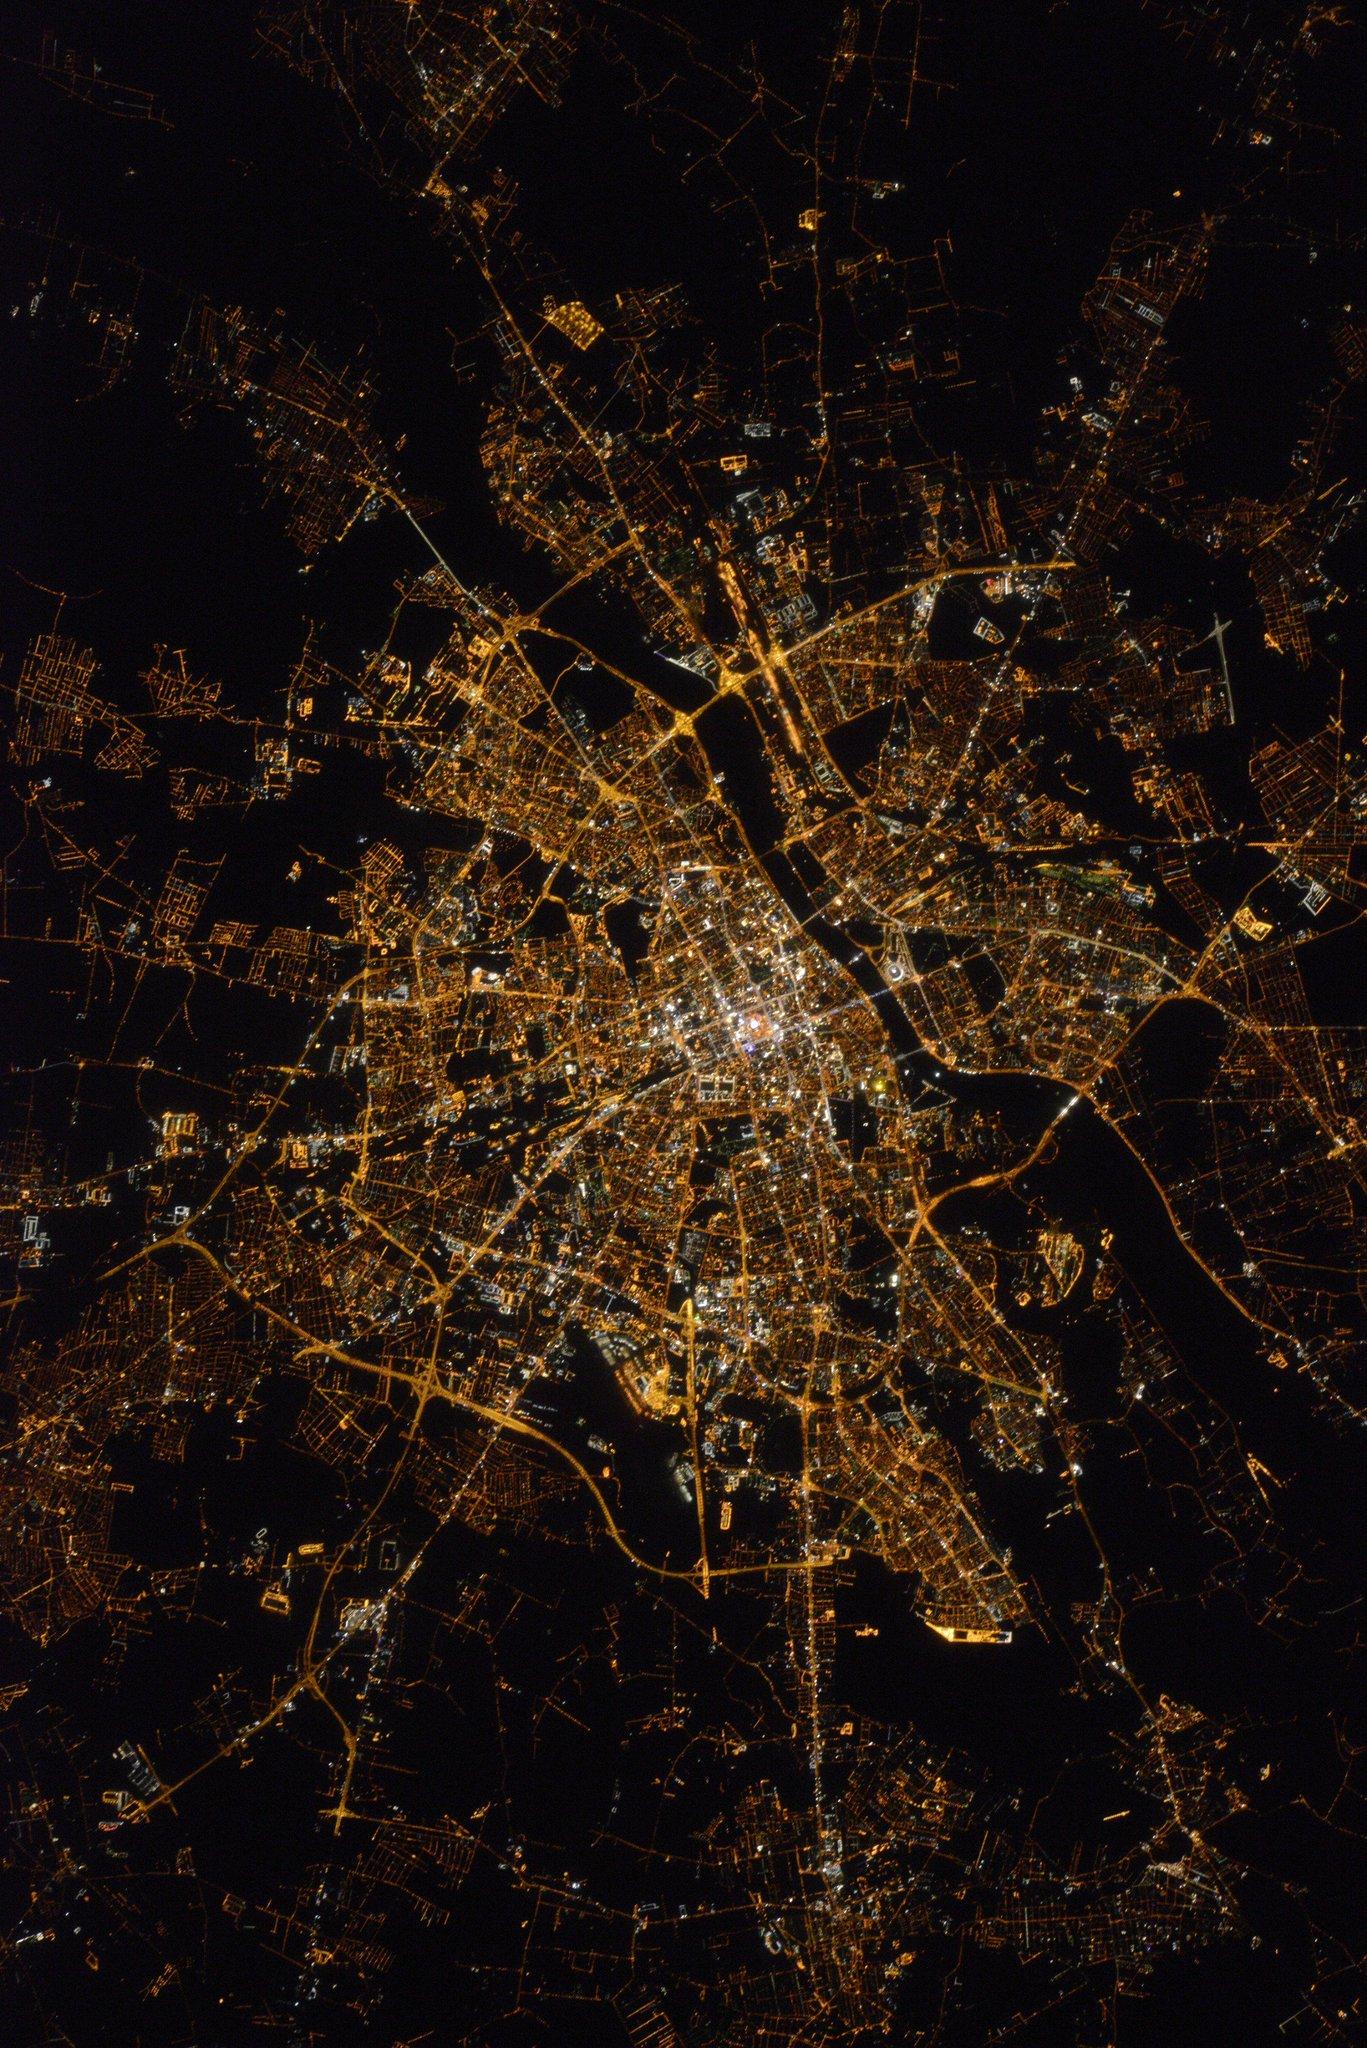 spacecraft krakow - photo #13